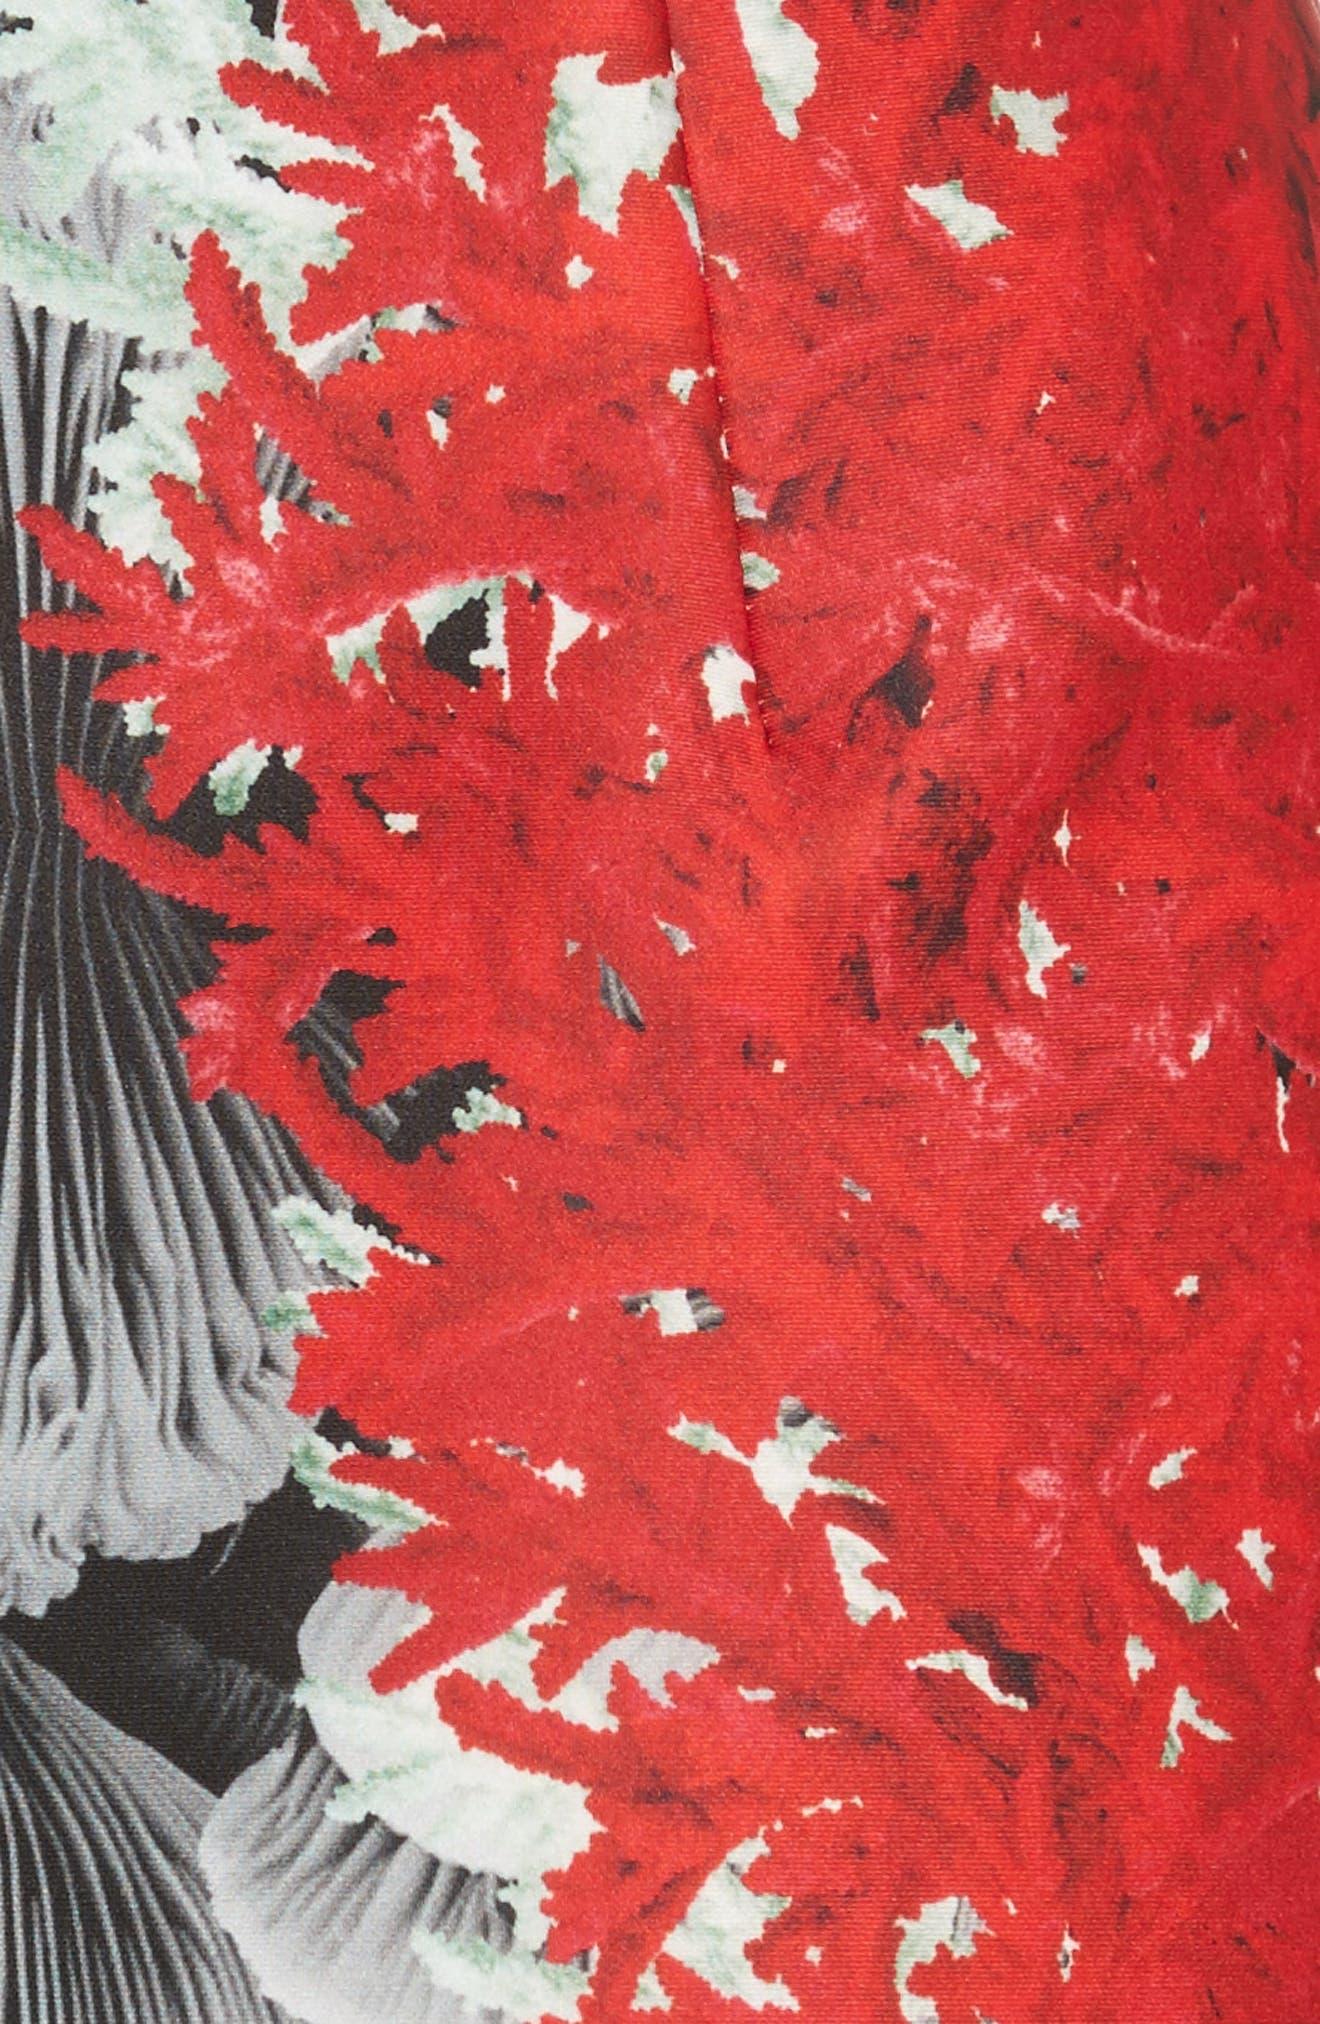 Coral Print Scuba Sheath Dress,                             Alternate thumbnail 6, color,                             Grey Multi